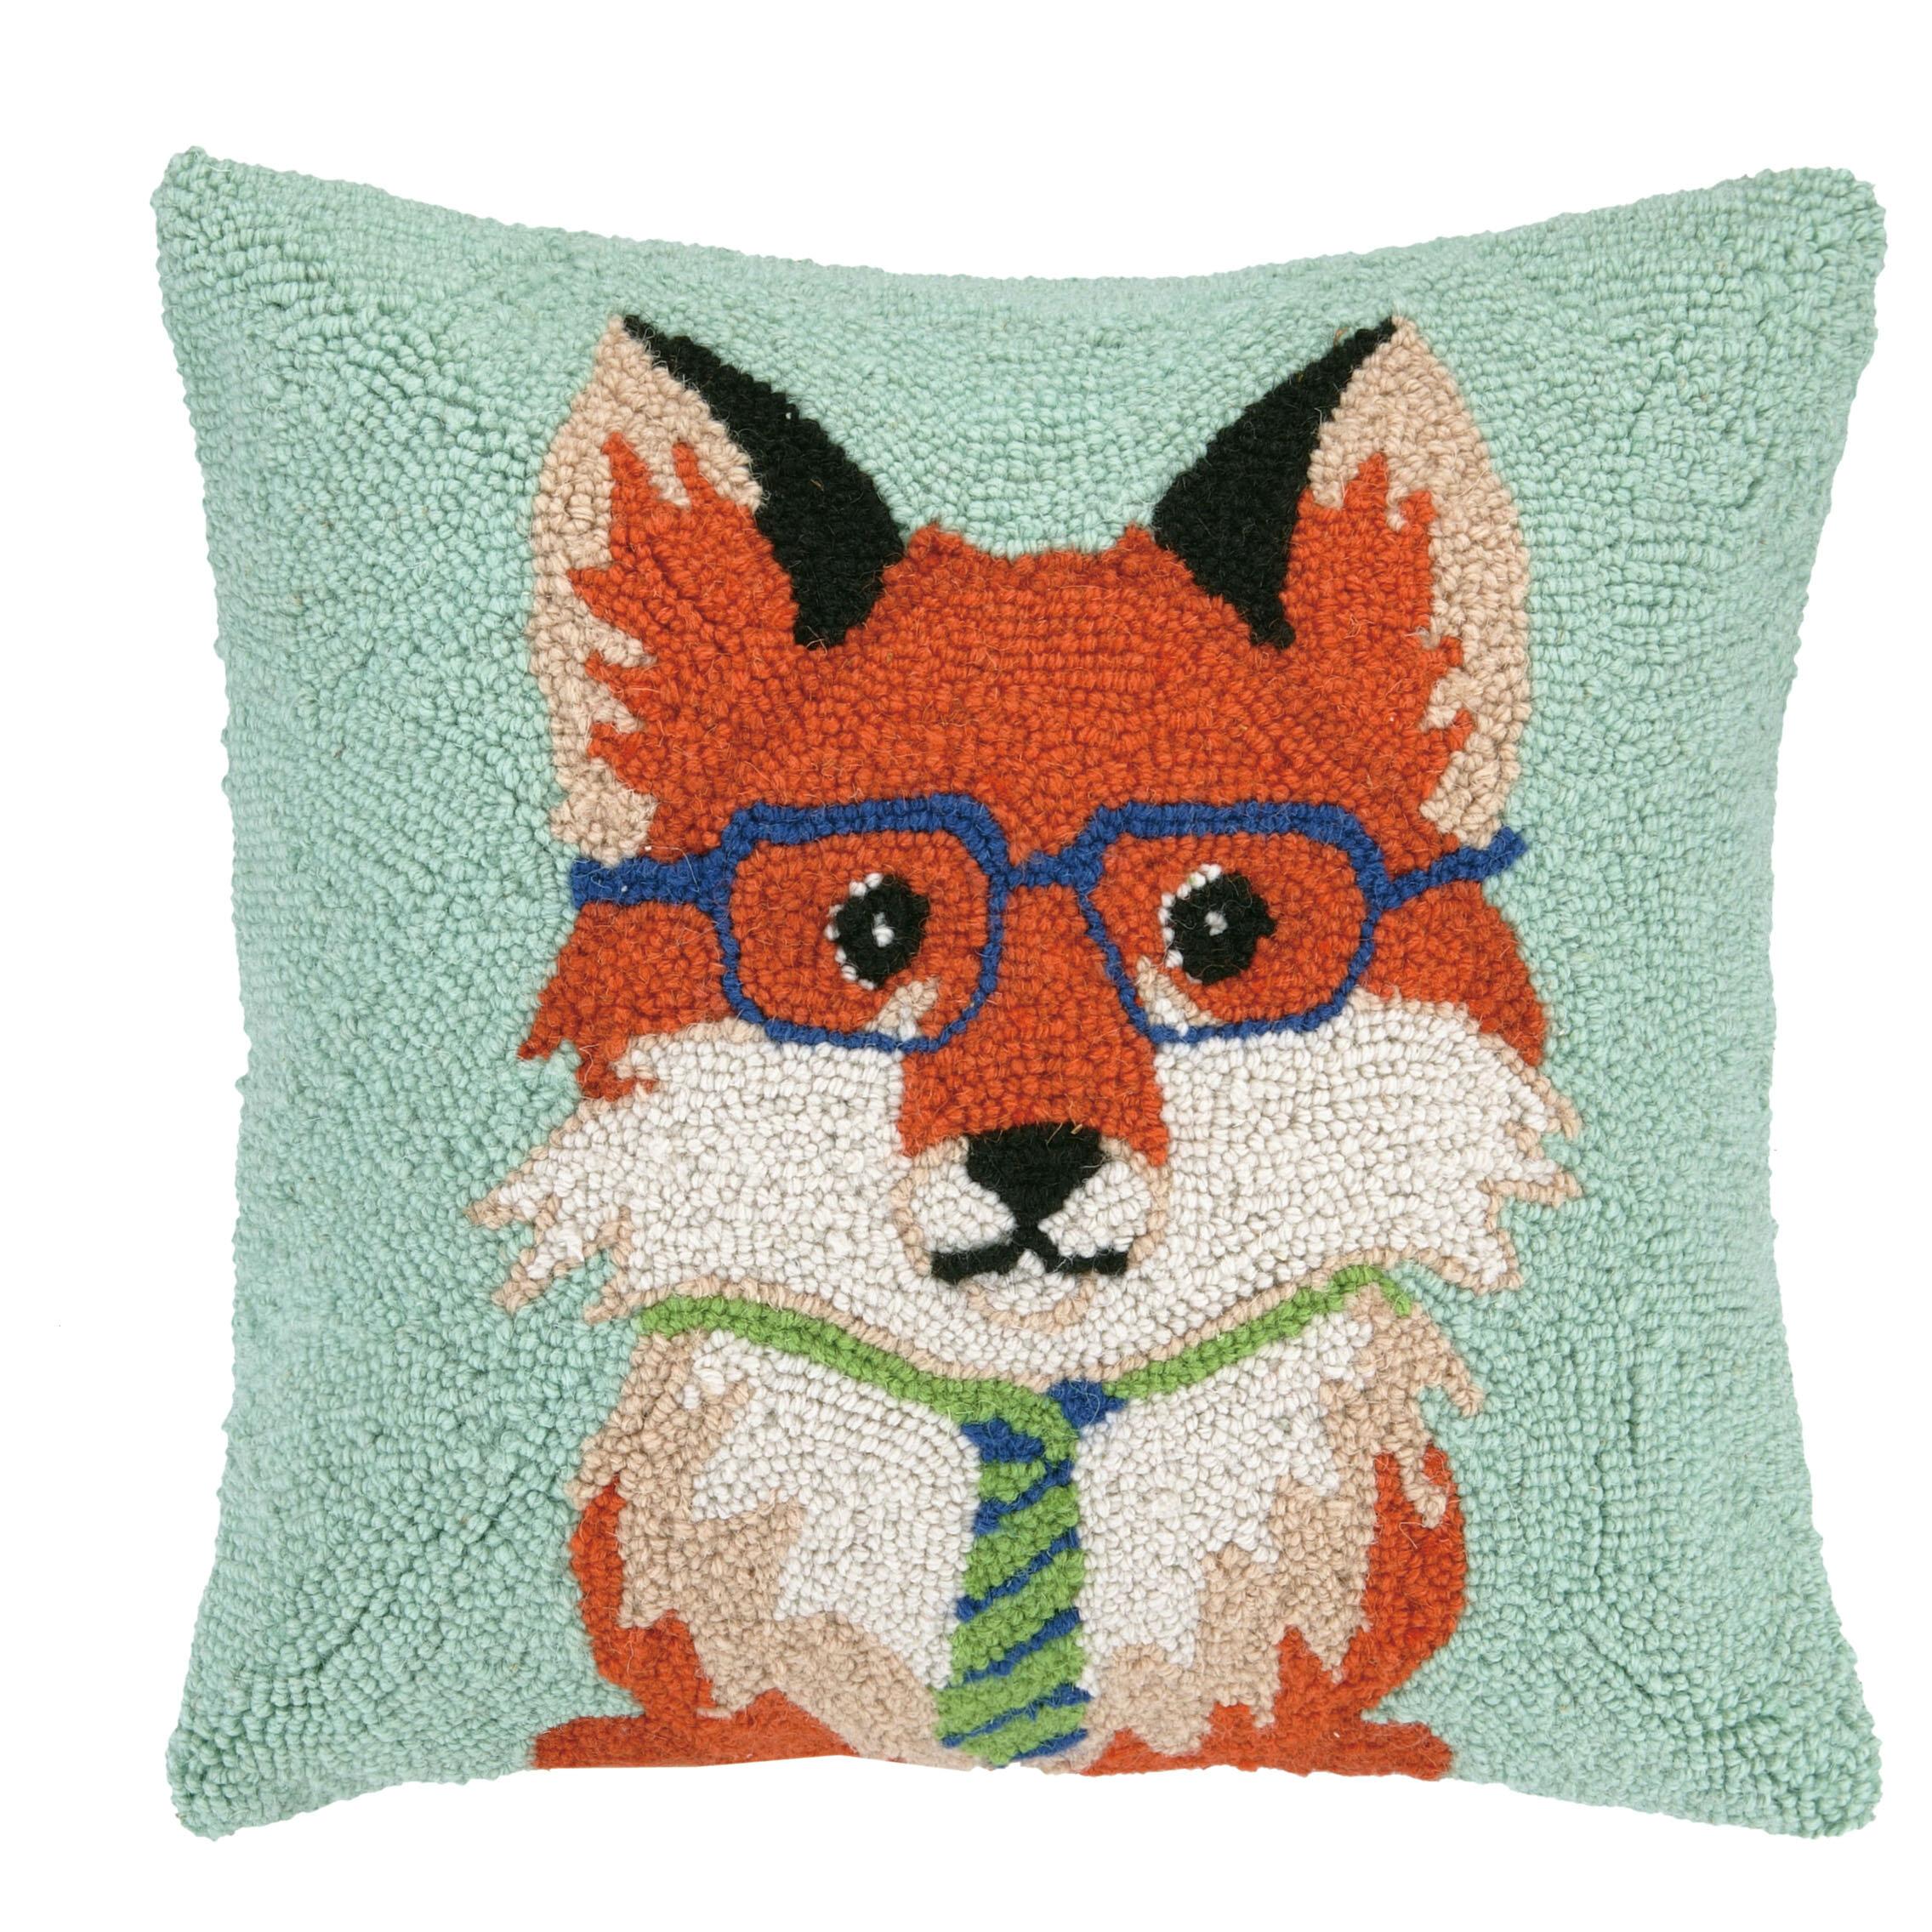 home com giraffe pillow modern cushion minimalist from cat sofa pillowcase garden comfortable item fox group alibaba in cartoon on car aliexpress